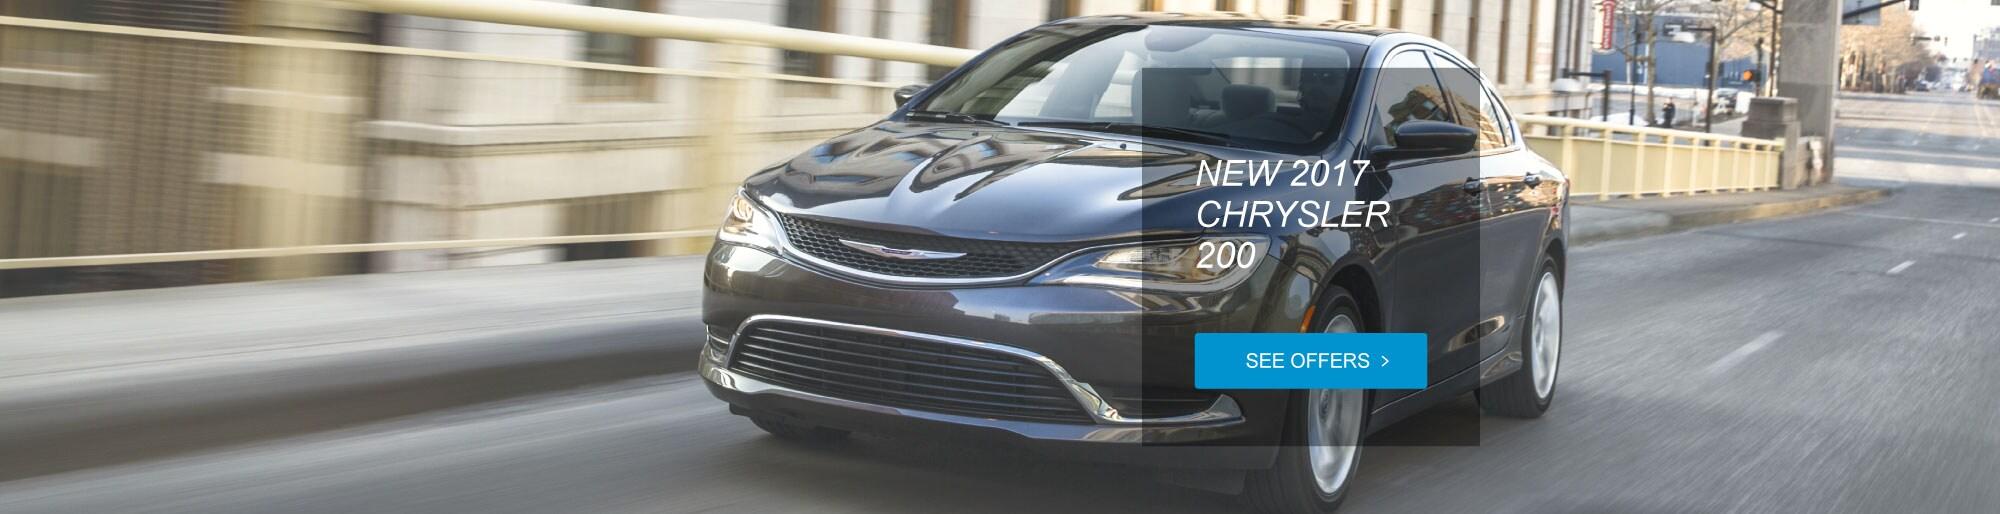 Car Dealerships In Fargo Nd >> New Dodge Jeep RAM Chrysler & Used Car Dealership in Grand ...